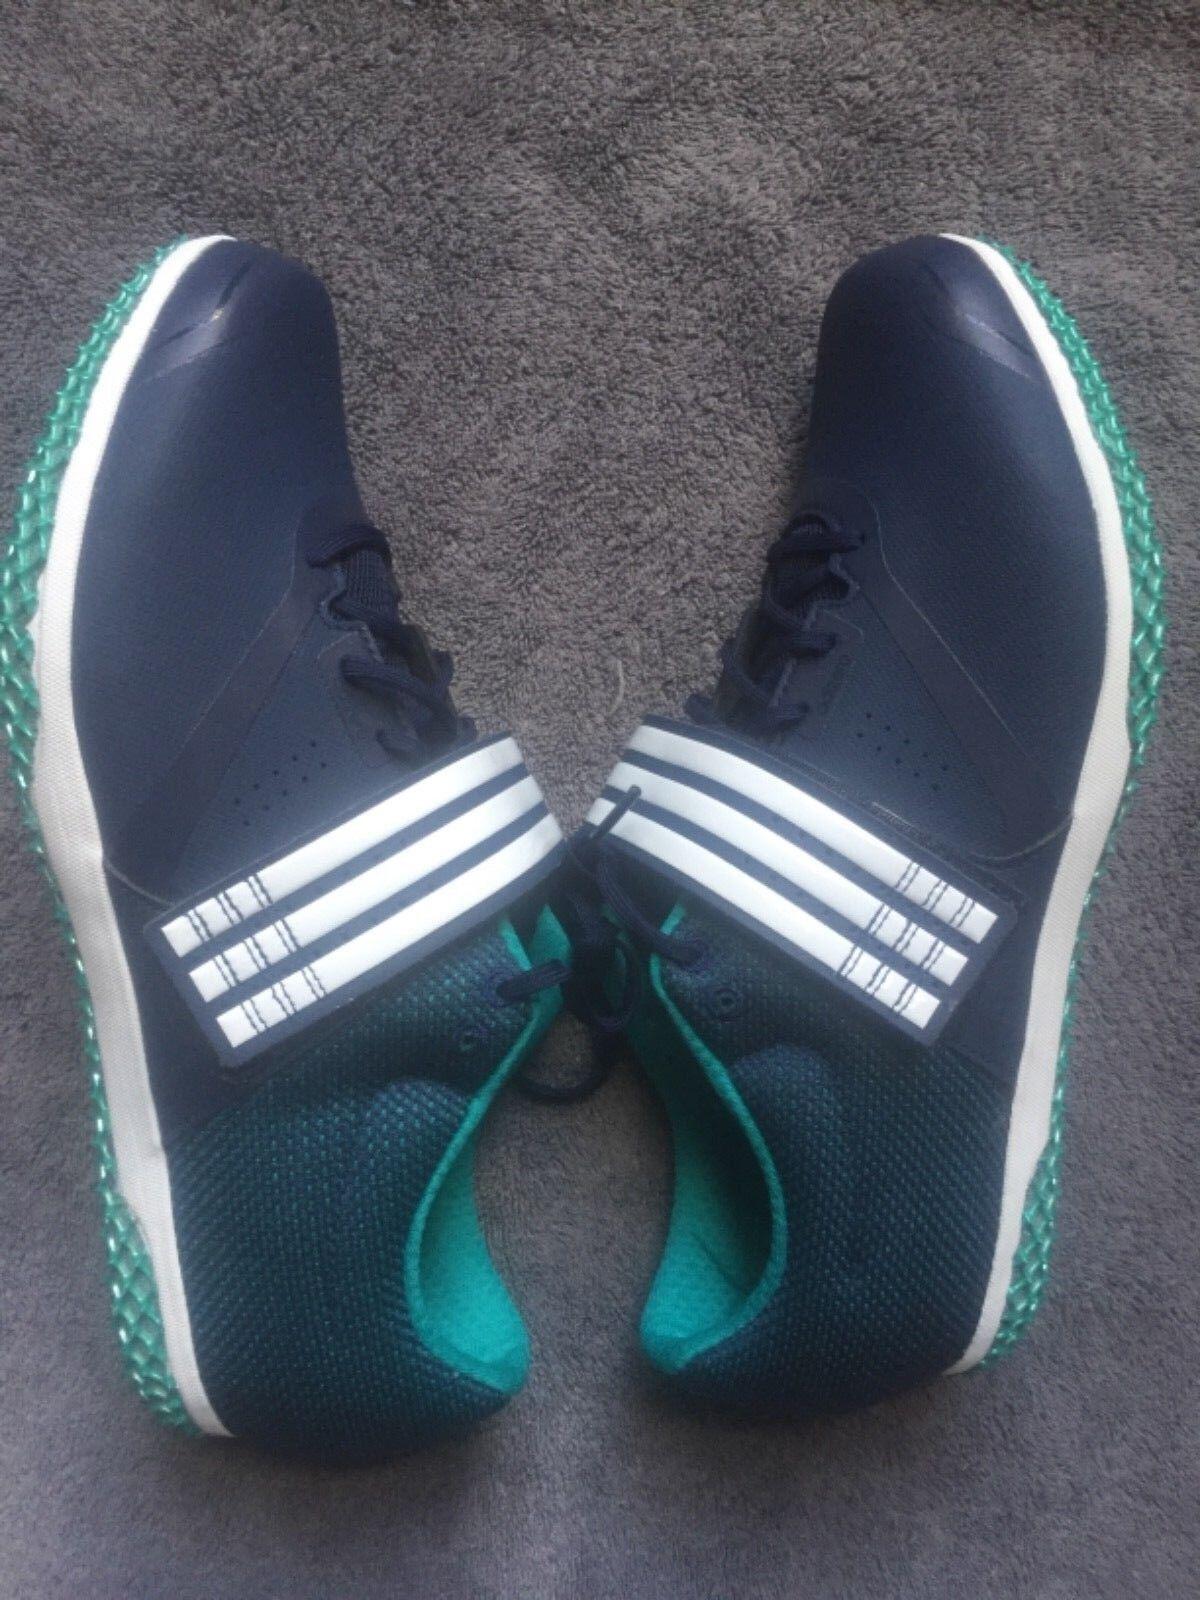 Adidas adizero 12 hj spike (af5645) uomo: 12 adizero - 7234c3